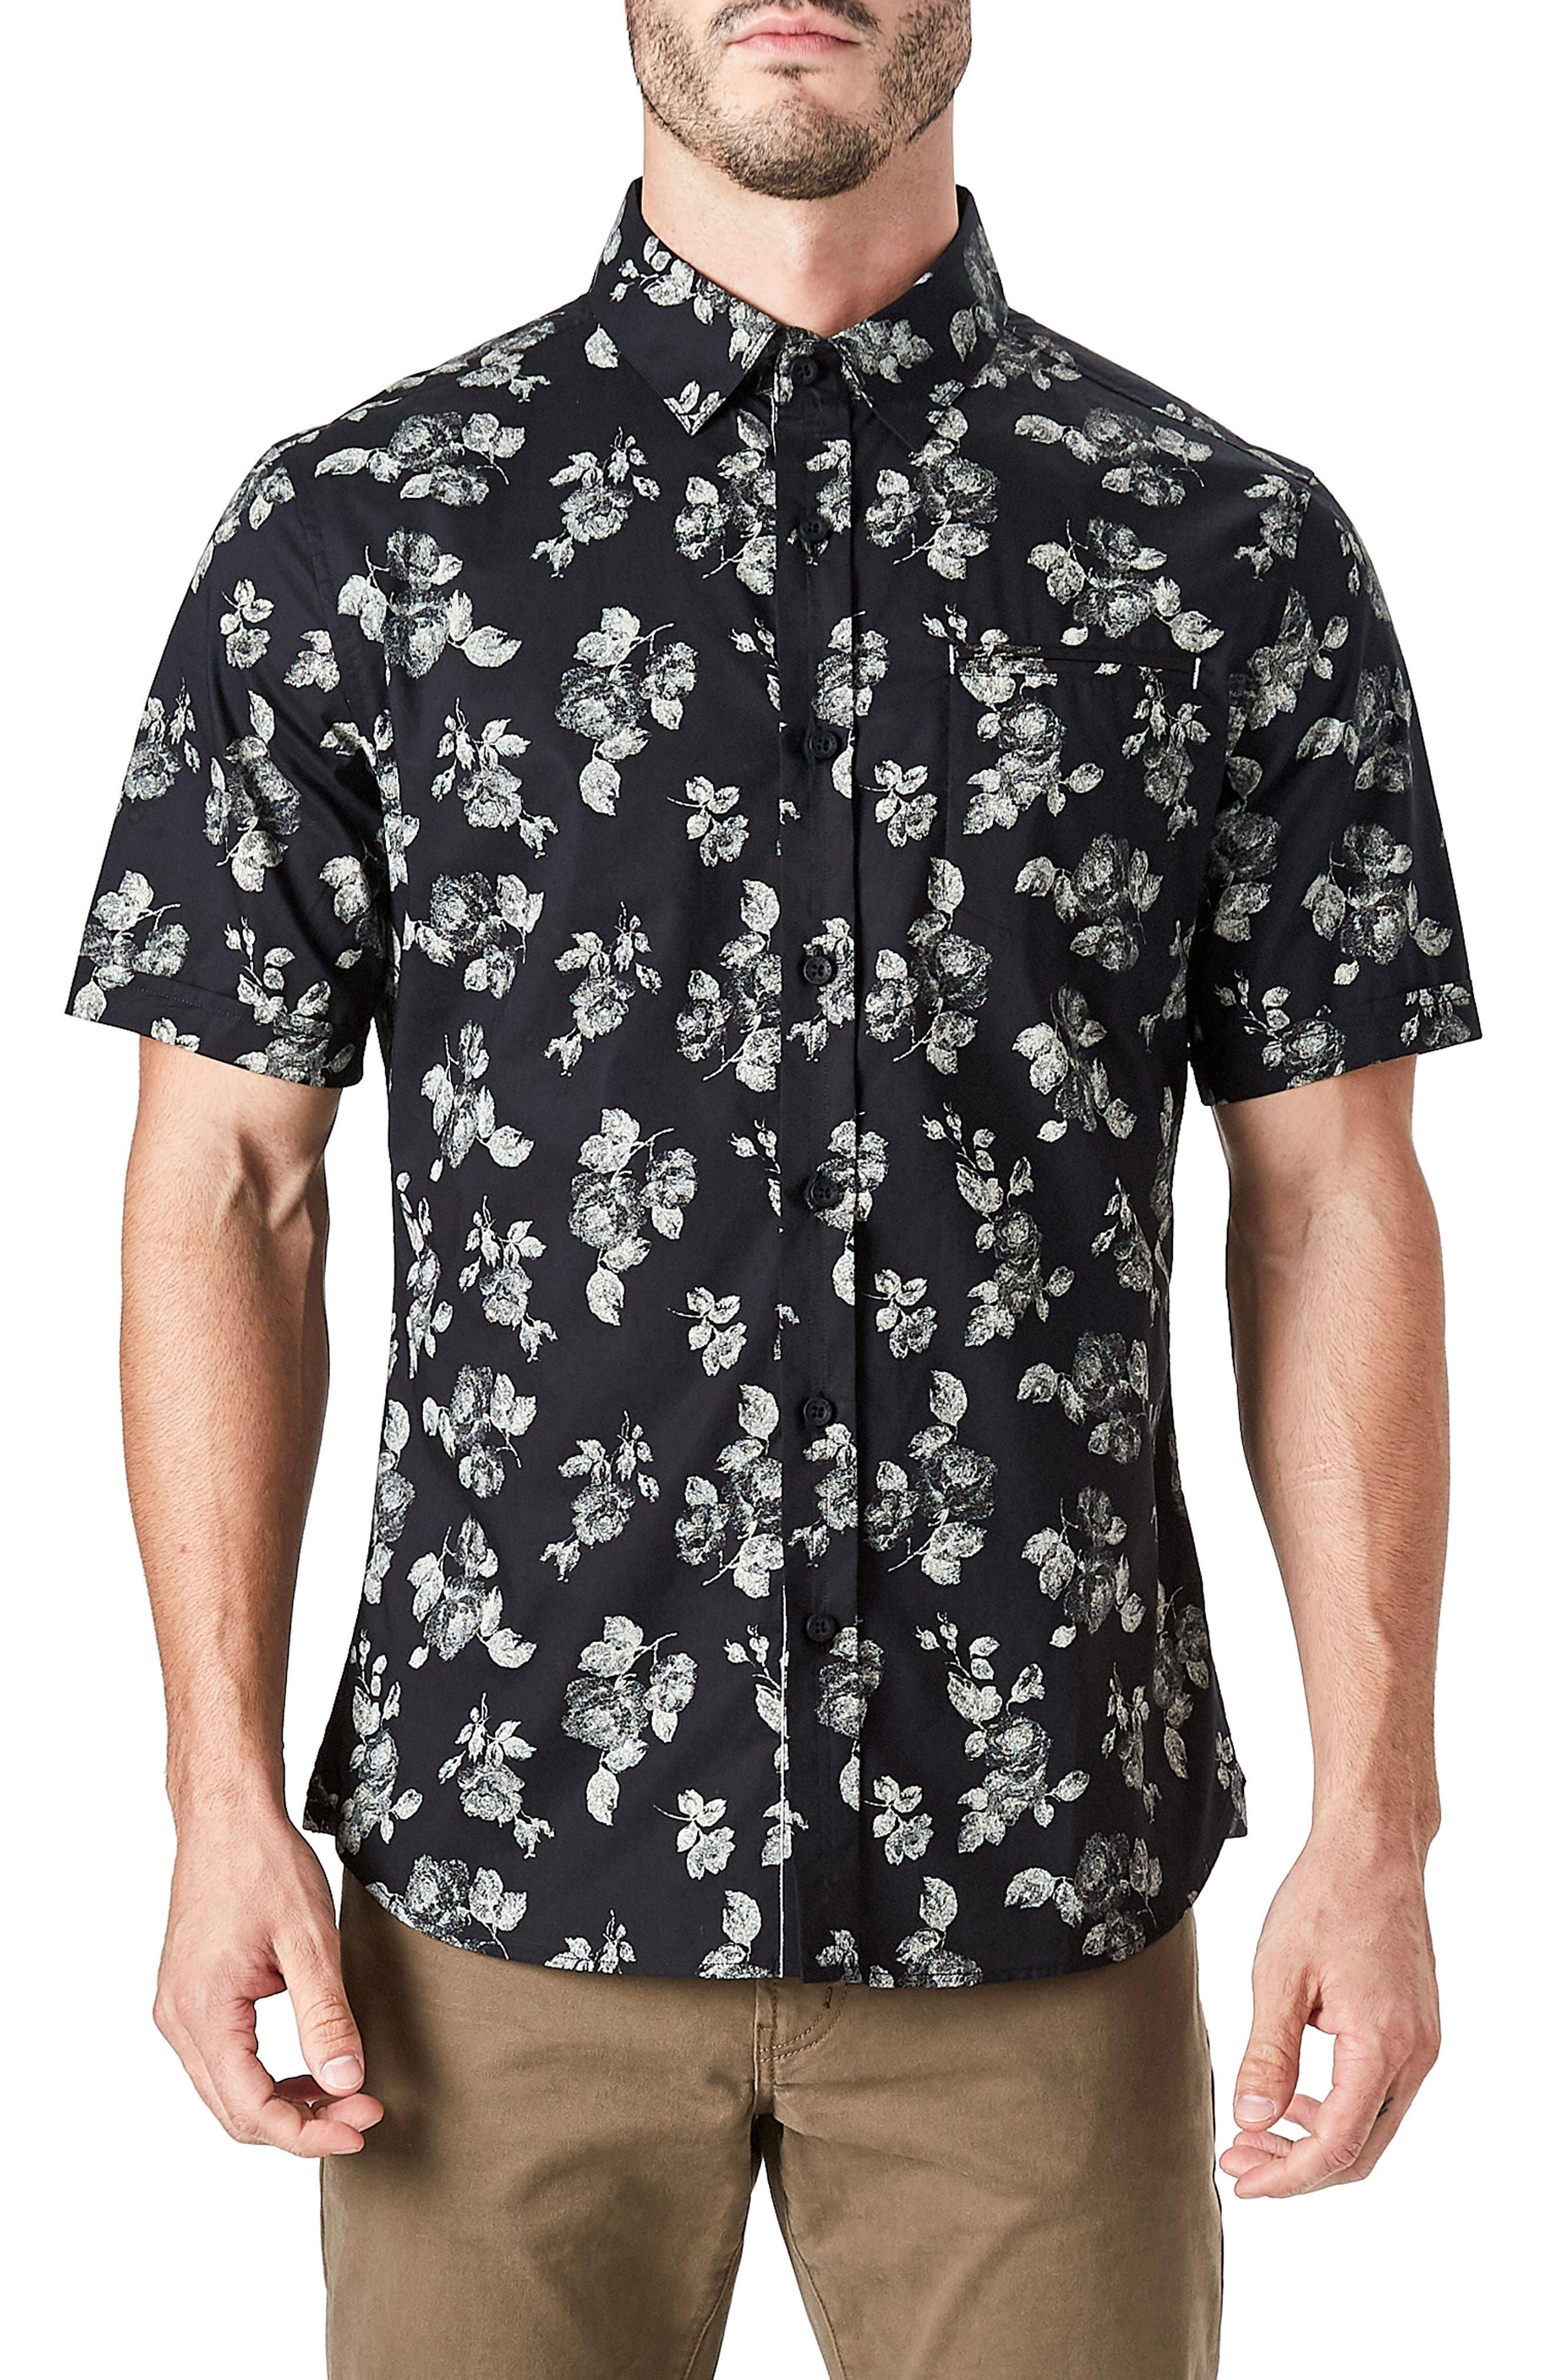 Human Nature Woven Shirt,                         Main,                         color, Black